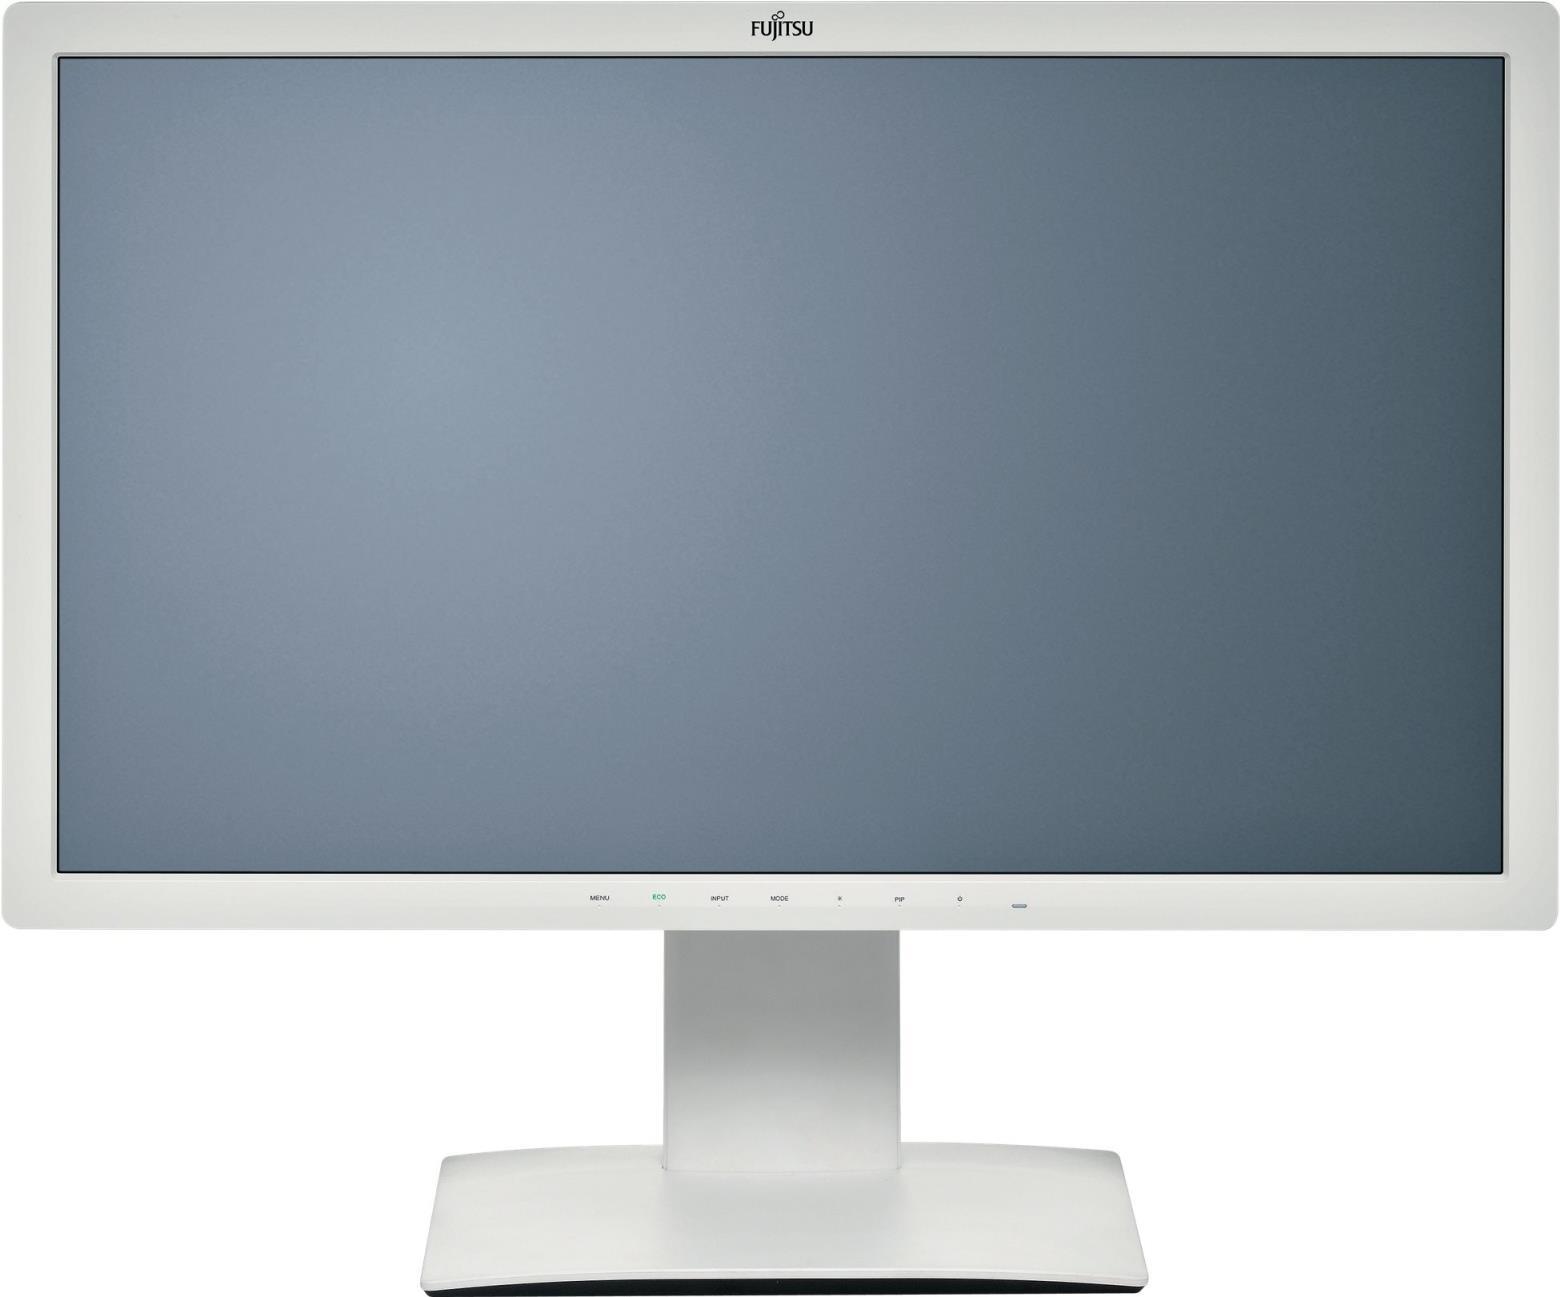 Fujitsu P27T-7 LED - Premium Line - LED-Monitor - UHD - IPS - 68,5cm - 3840x2160 - 5ms - 350 cd/m2 - 1000:1 - 5 ms - HDMI, DVI-D (S26361-K1564-V140) - Sonderposten